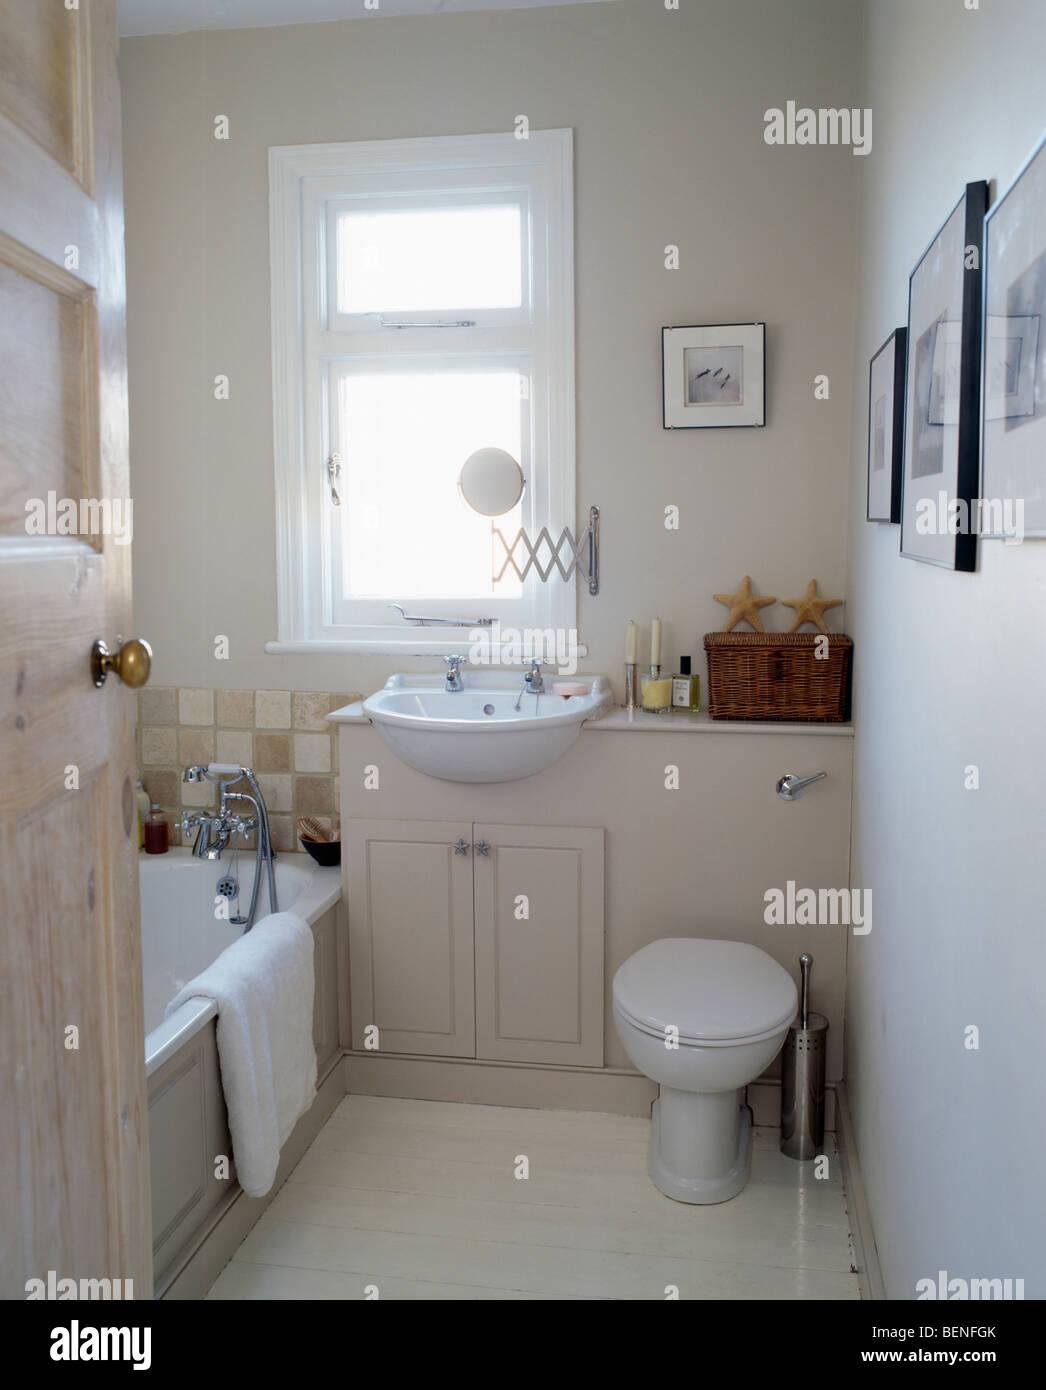 Door open to small modern cream bathroom Stock Photo - Alamy